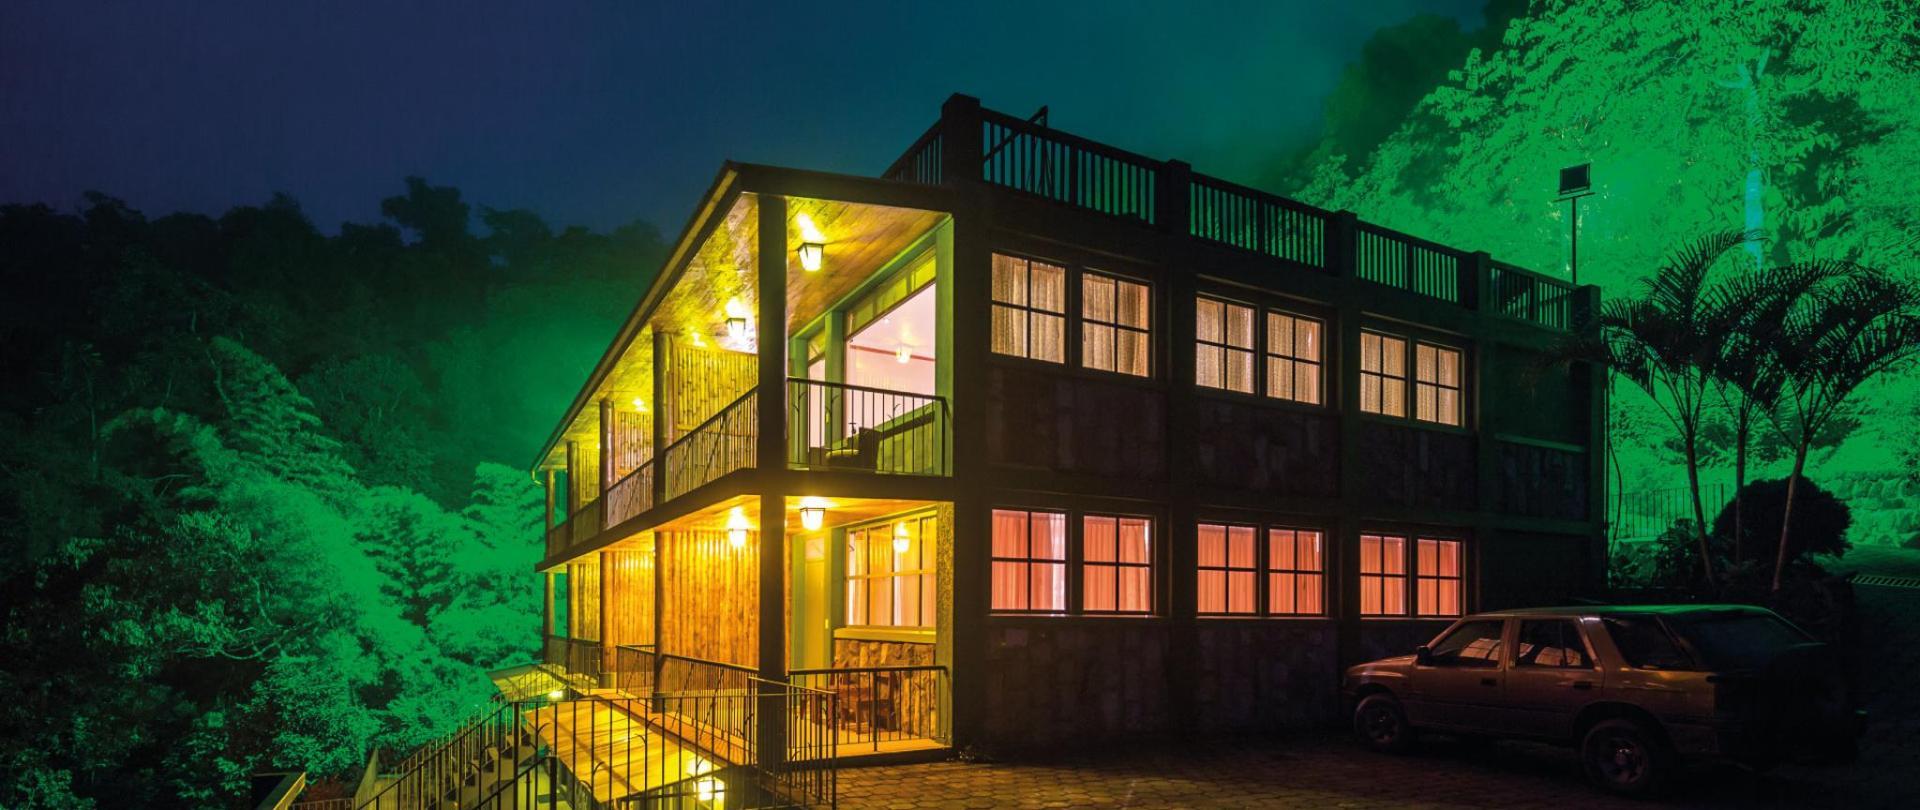 Yumbo-Spa-and-Resort-Hotel-en-Gualea-Rooms.jpg